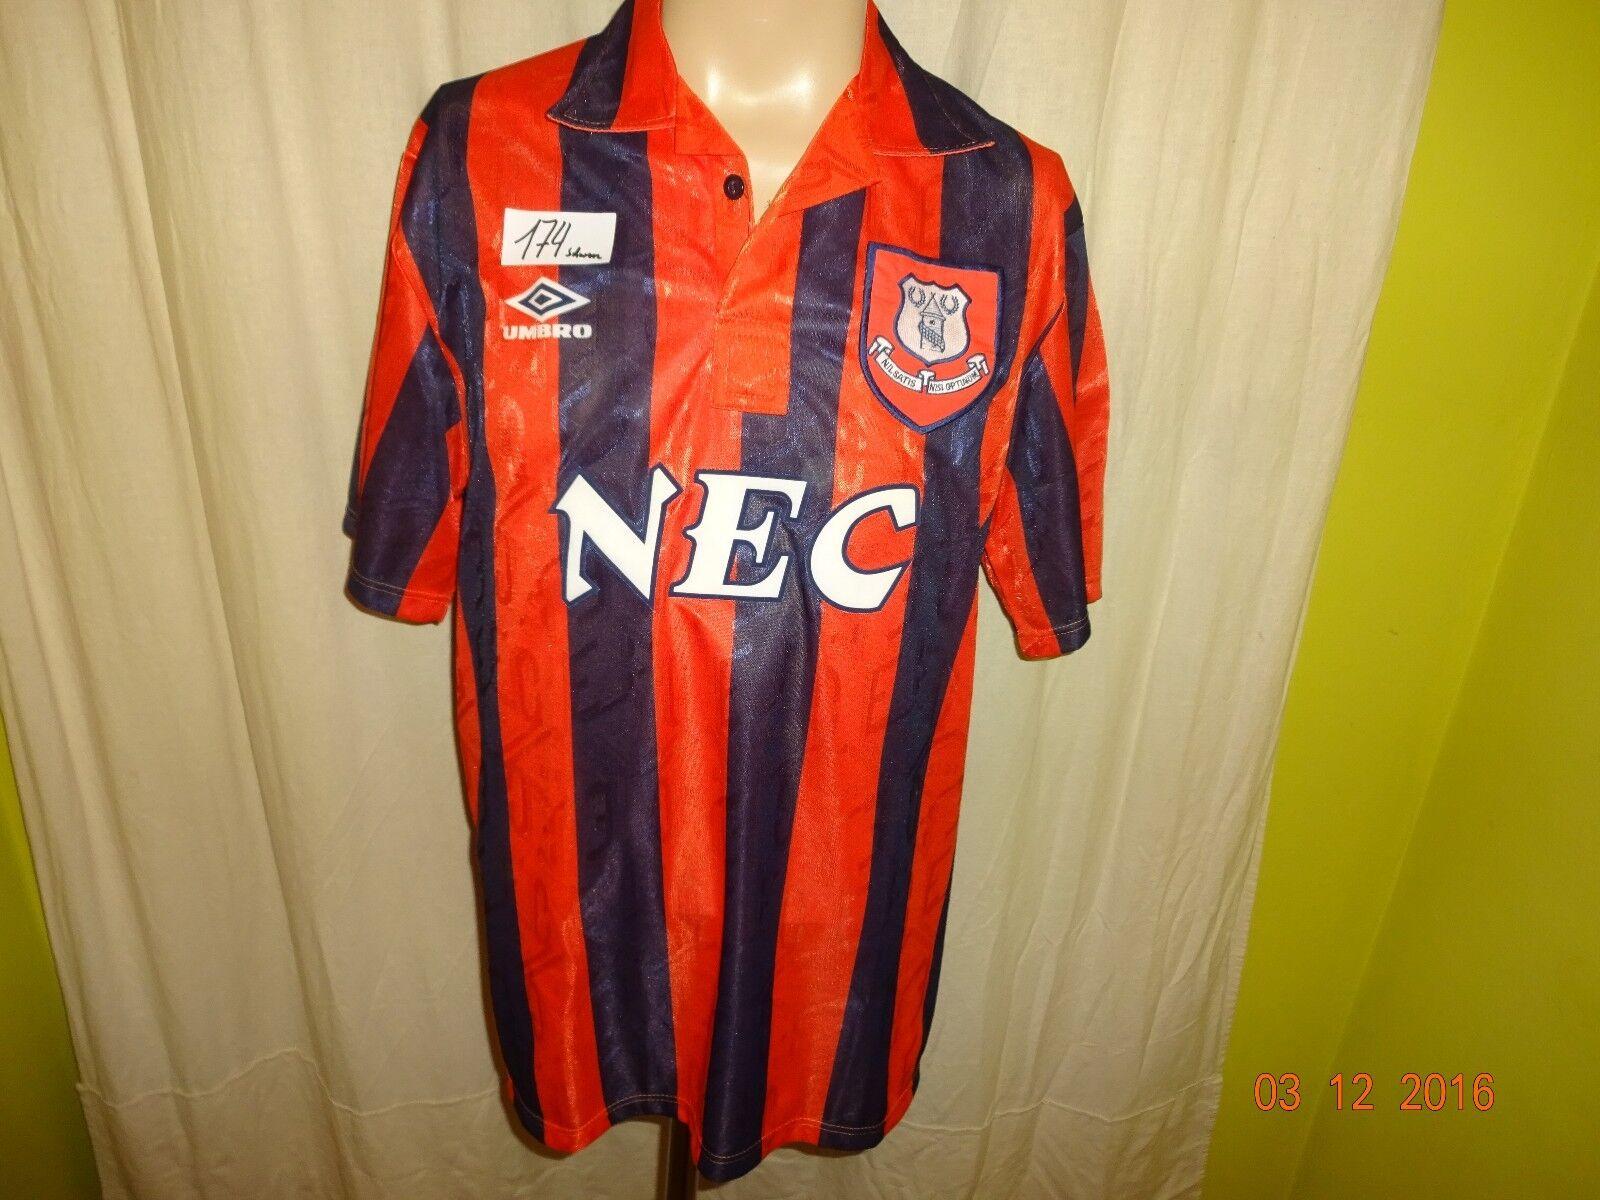 EGrünon FC Original umbro Auswärts Trikot 1991-1993  NEC  Gr.L TOP